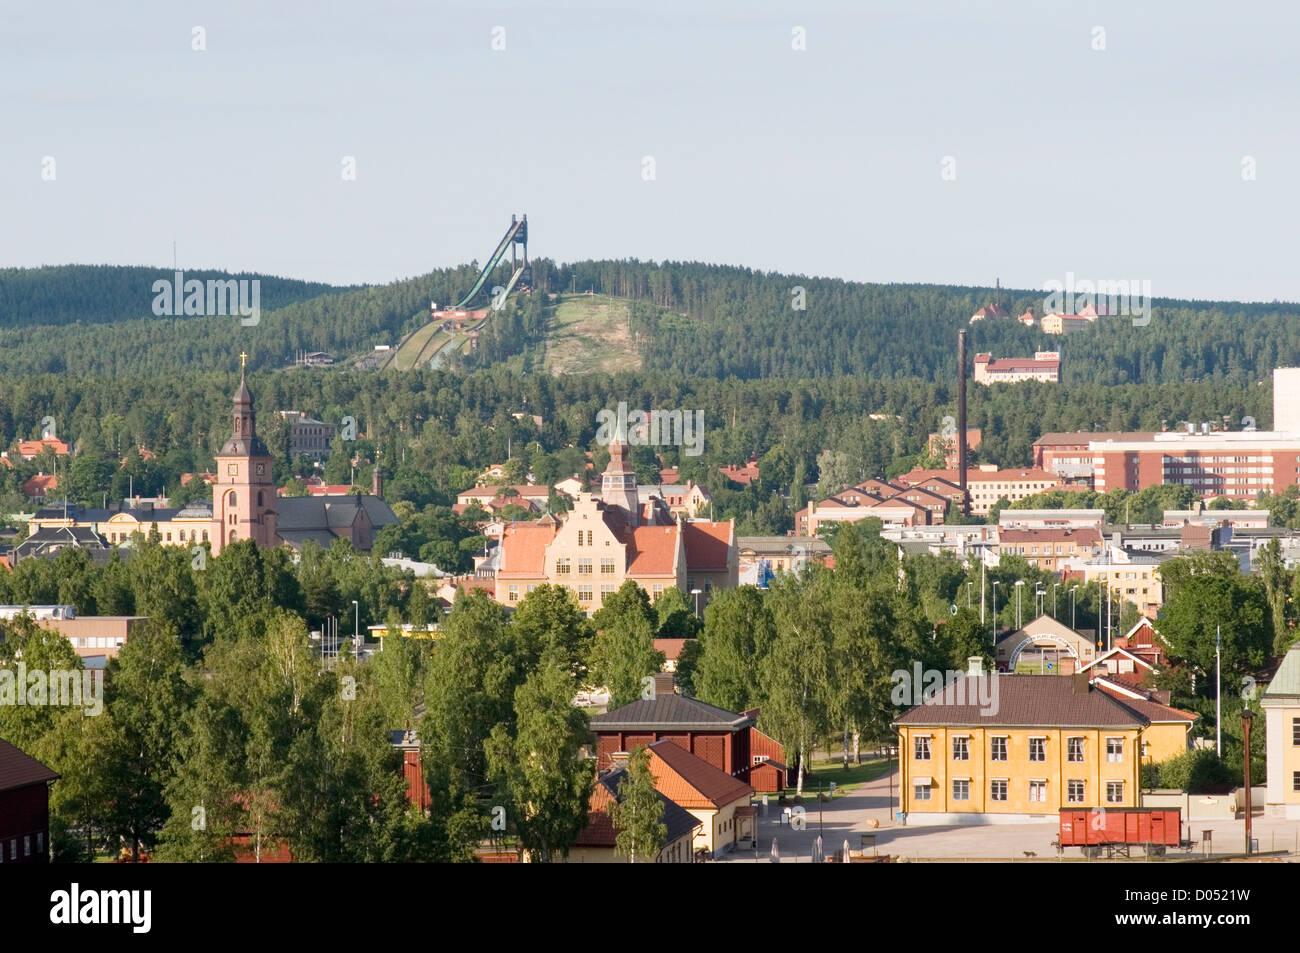 Falun Municipality in Dalarna County, Sweden swedish town city - Stock Image